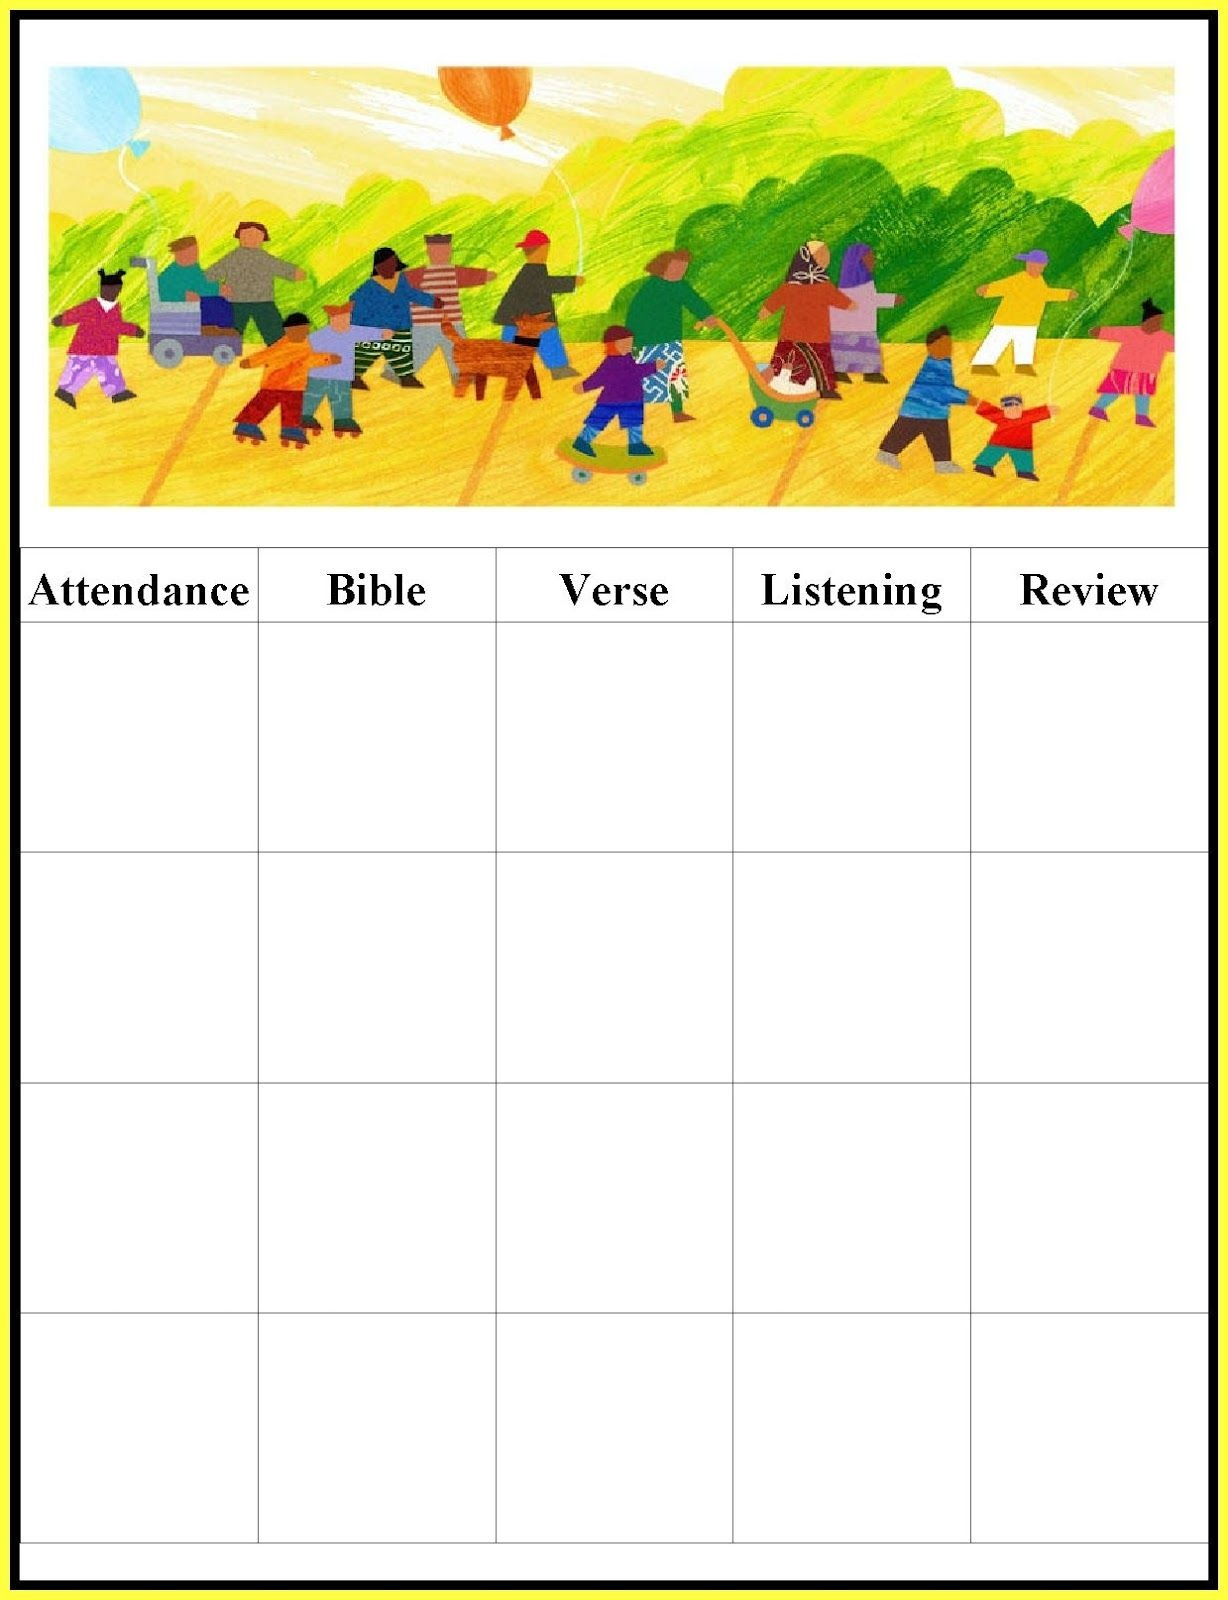 Childrens Gems In My Treasure Box: Sunday School - Attendance Charts - Free Printable Sunday School Attendance Sheet